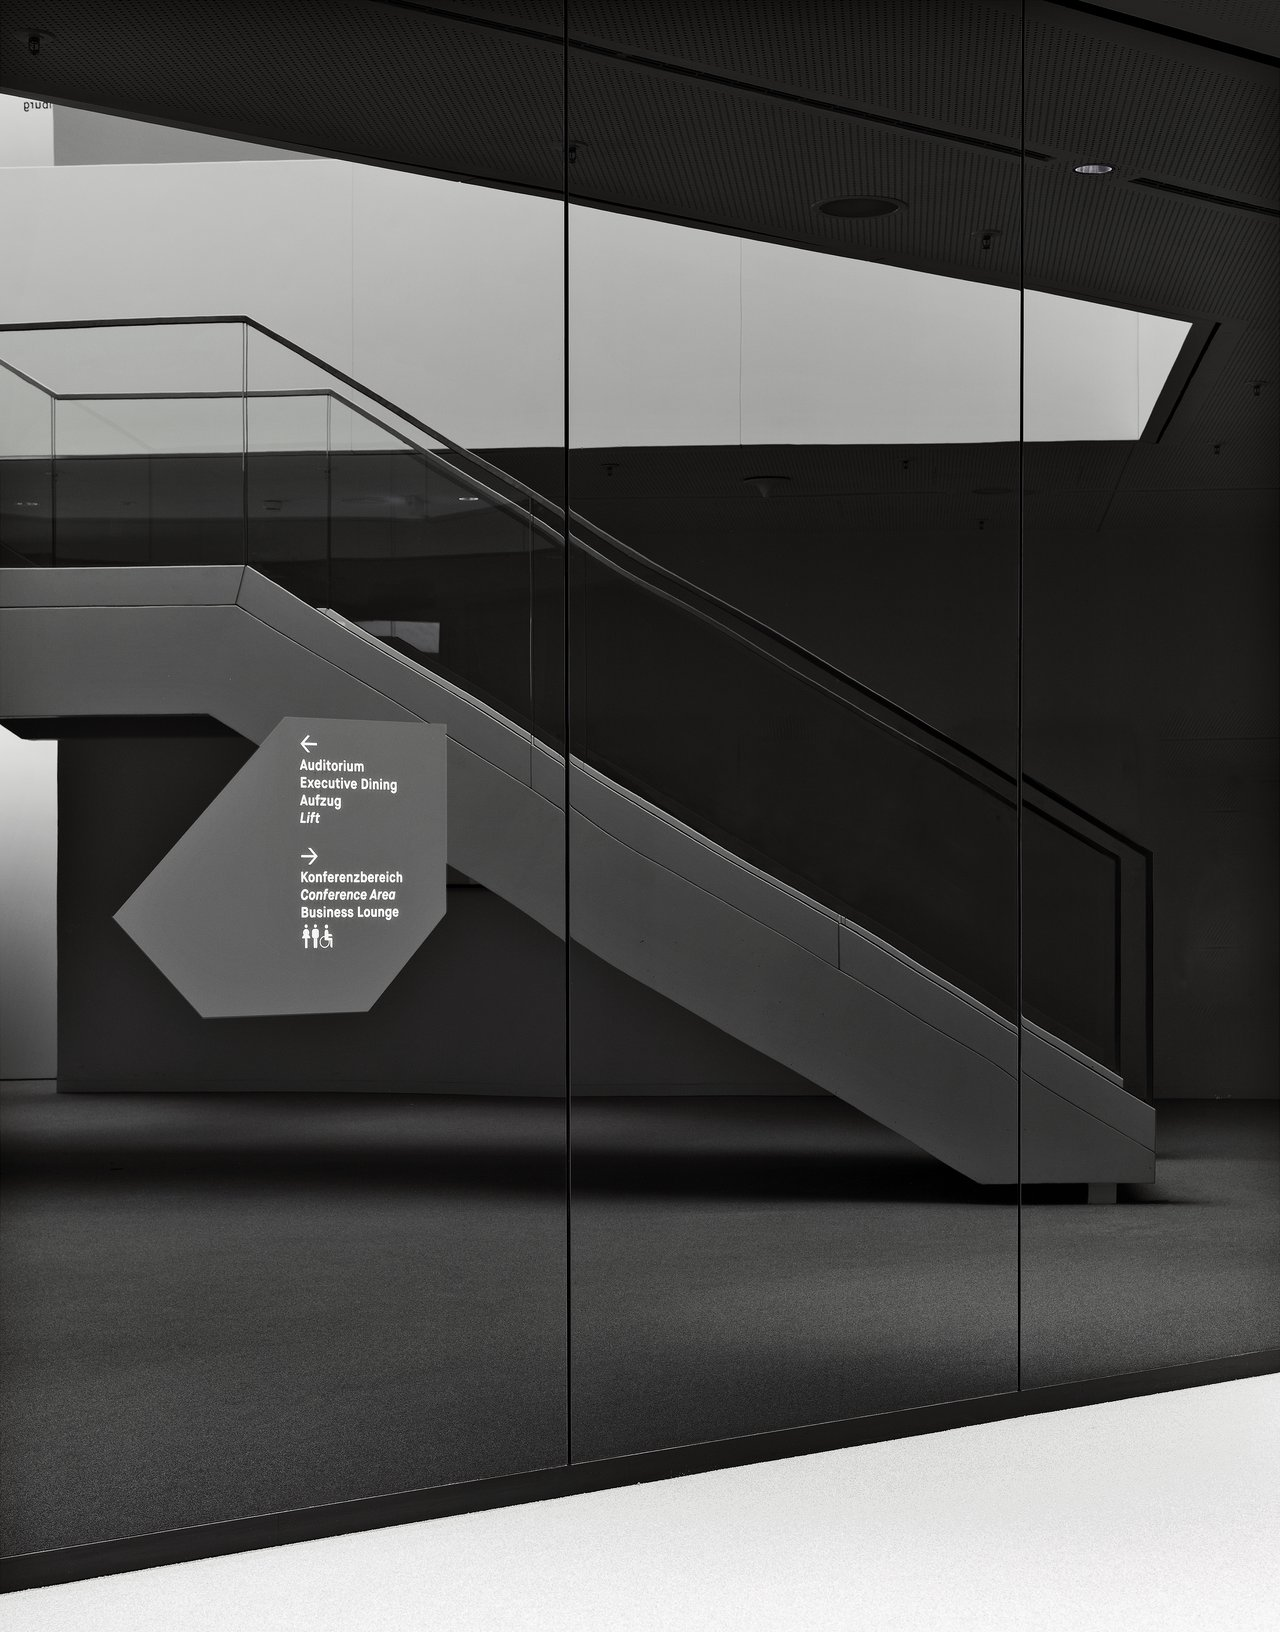 hypovereinsbank building,arabellapark  © büro uebele visuelle kommunikation